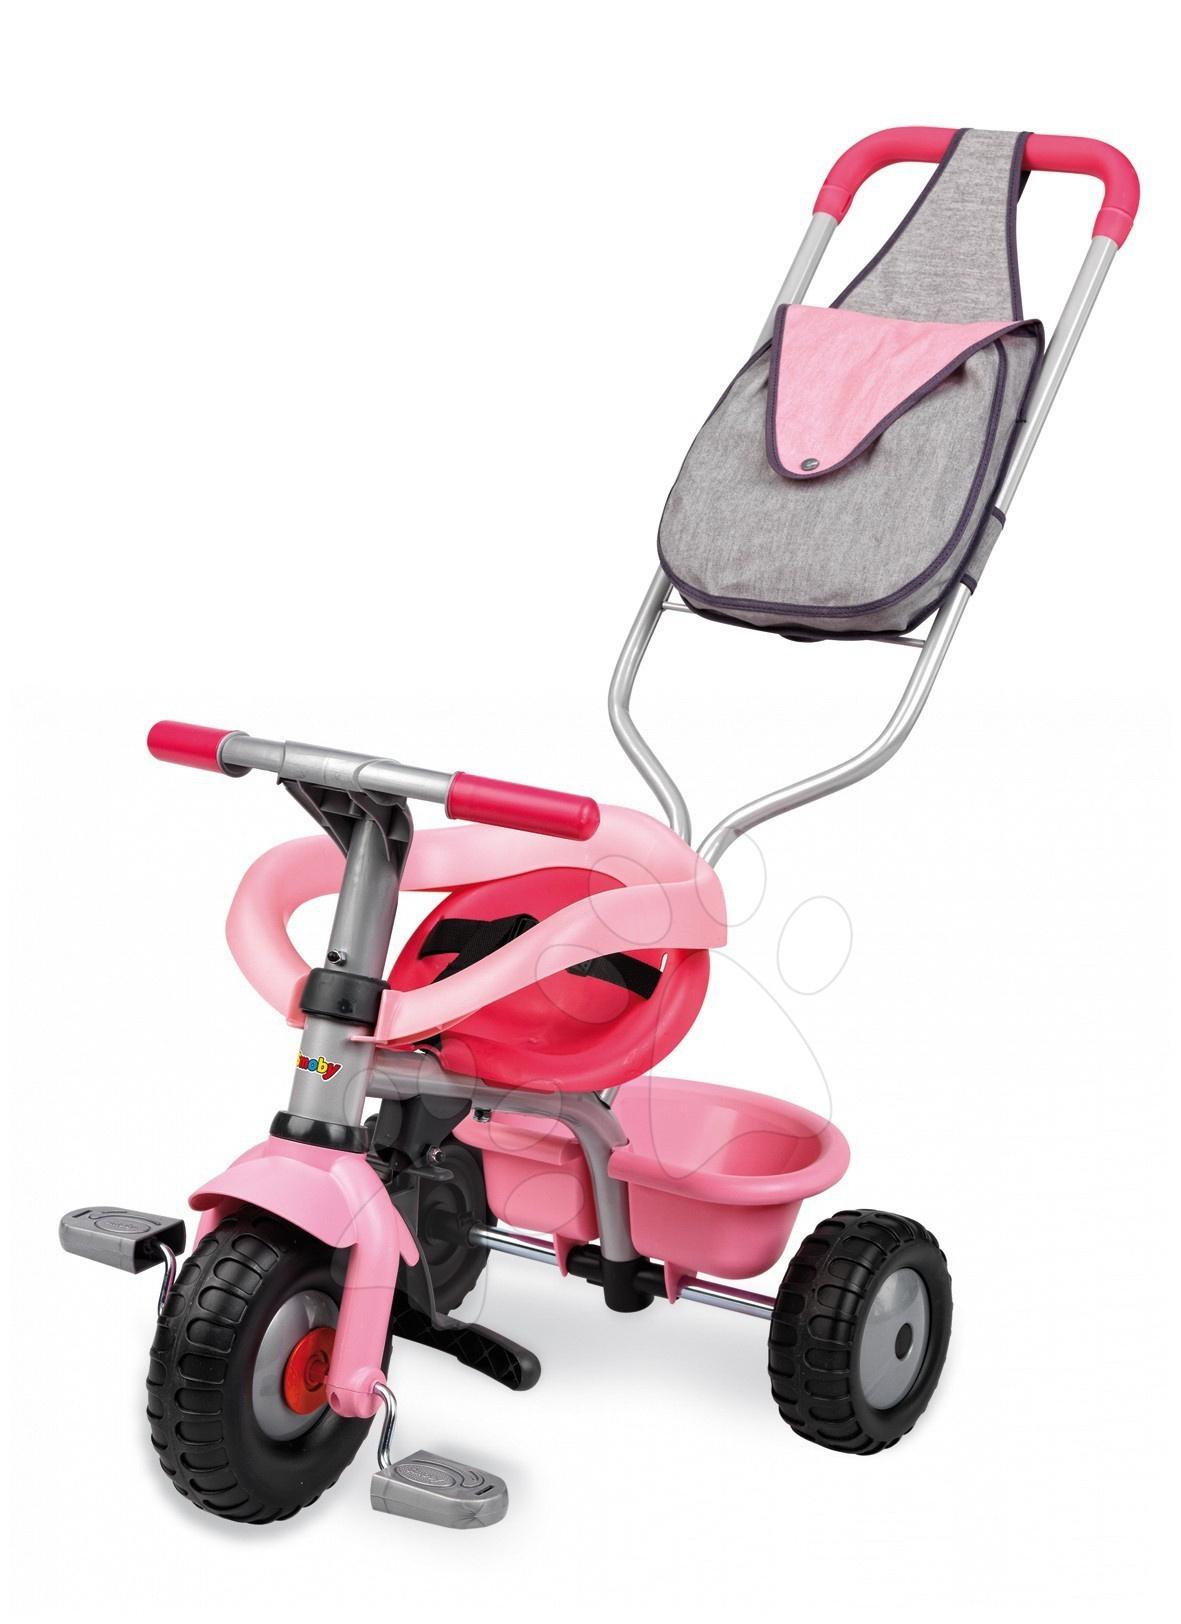 Tricikli od 10. meseca - Tricikel Be Fun Confort Smoby rožnati od 10 mes